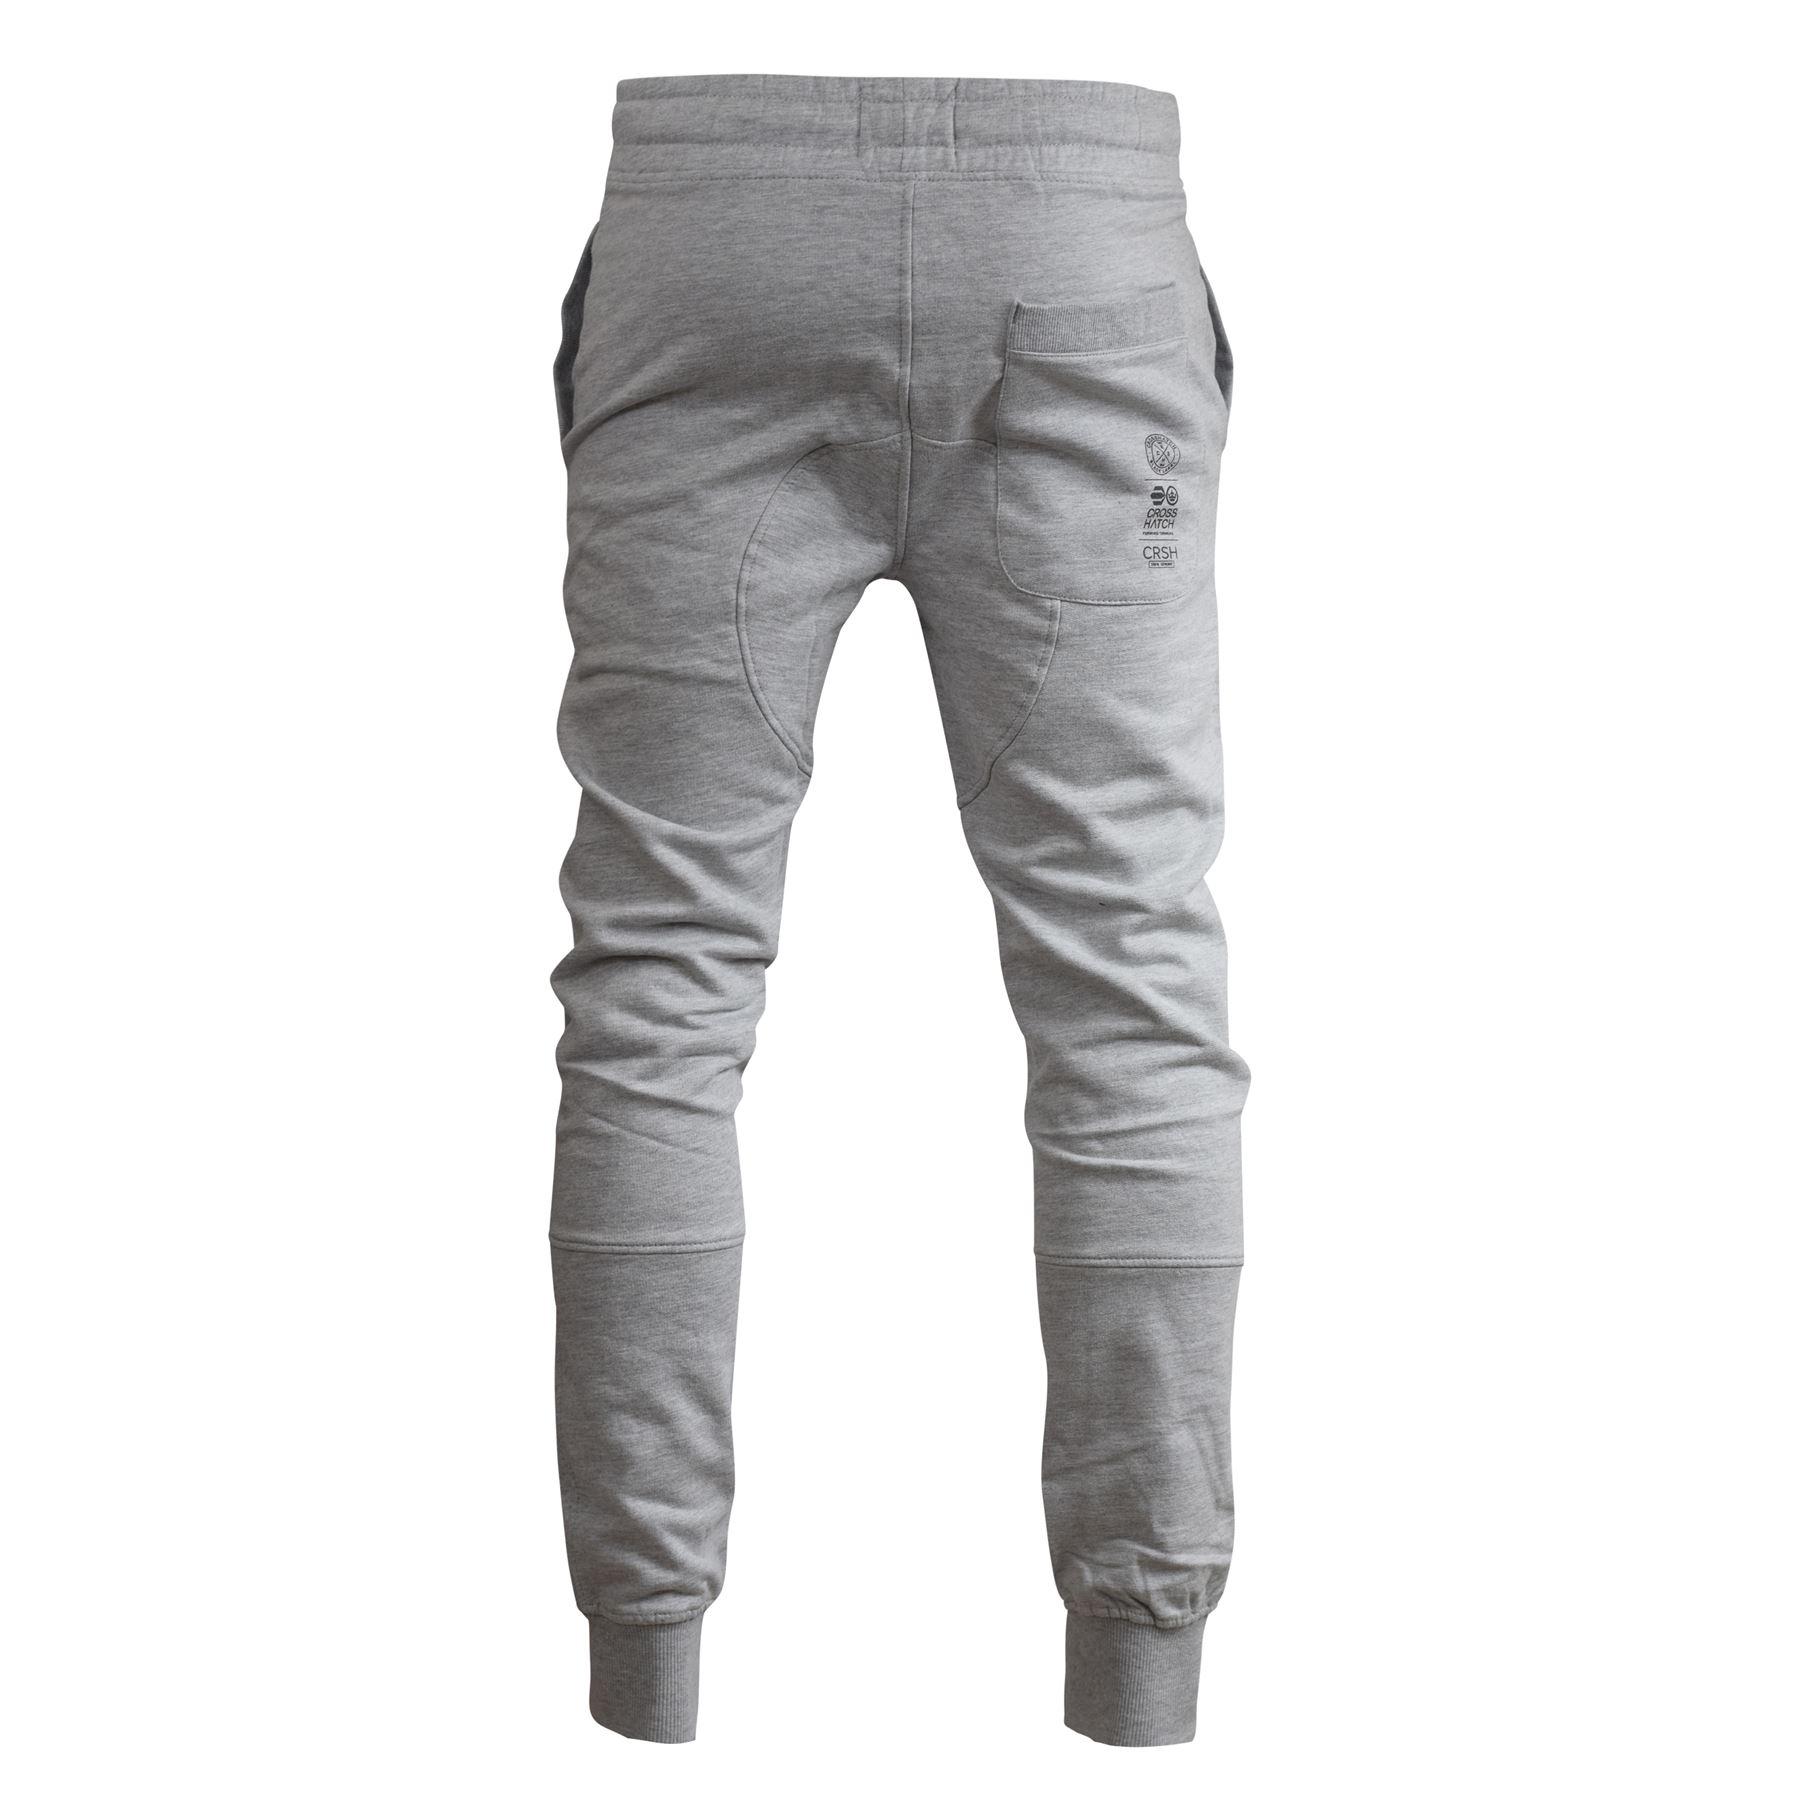 Para-Hombre-Pantalones-Basculador-Crosshatch-shacka-Flaca-Delgada-Chandal-Correr-Pantalones miniatura 13